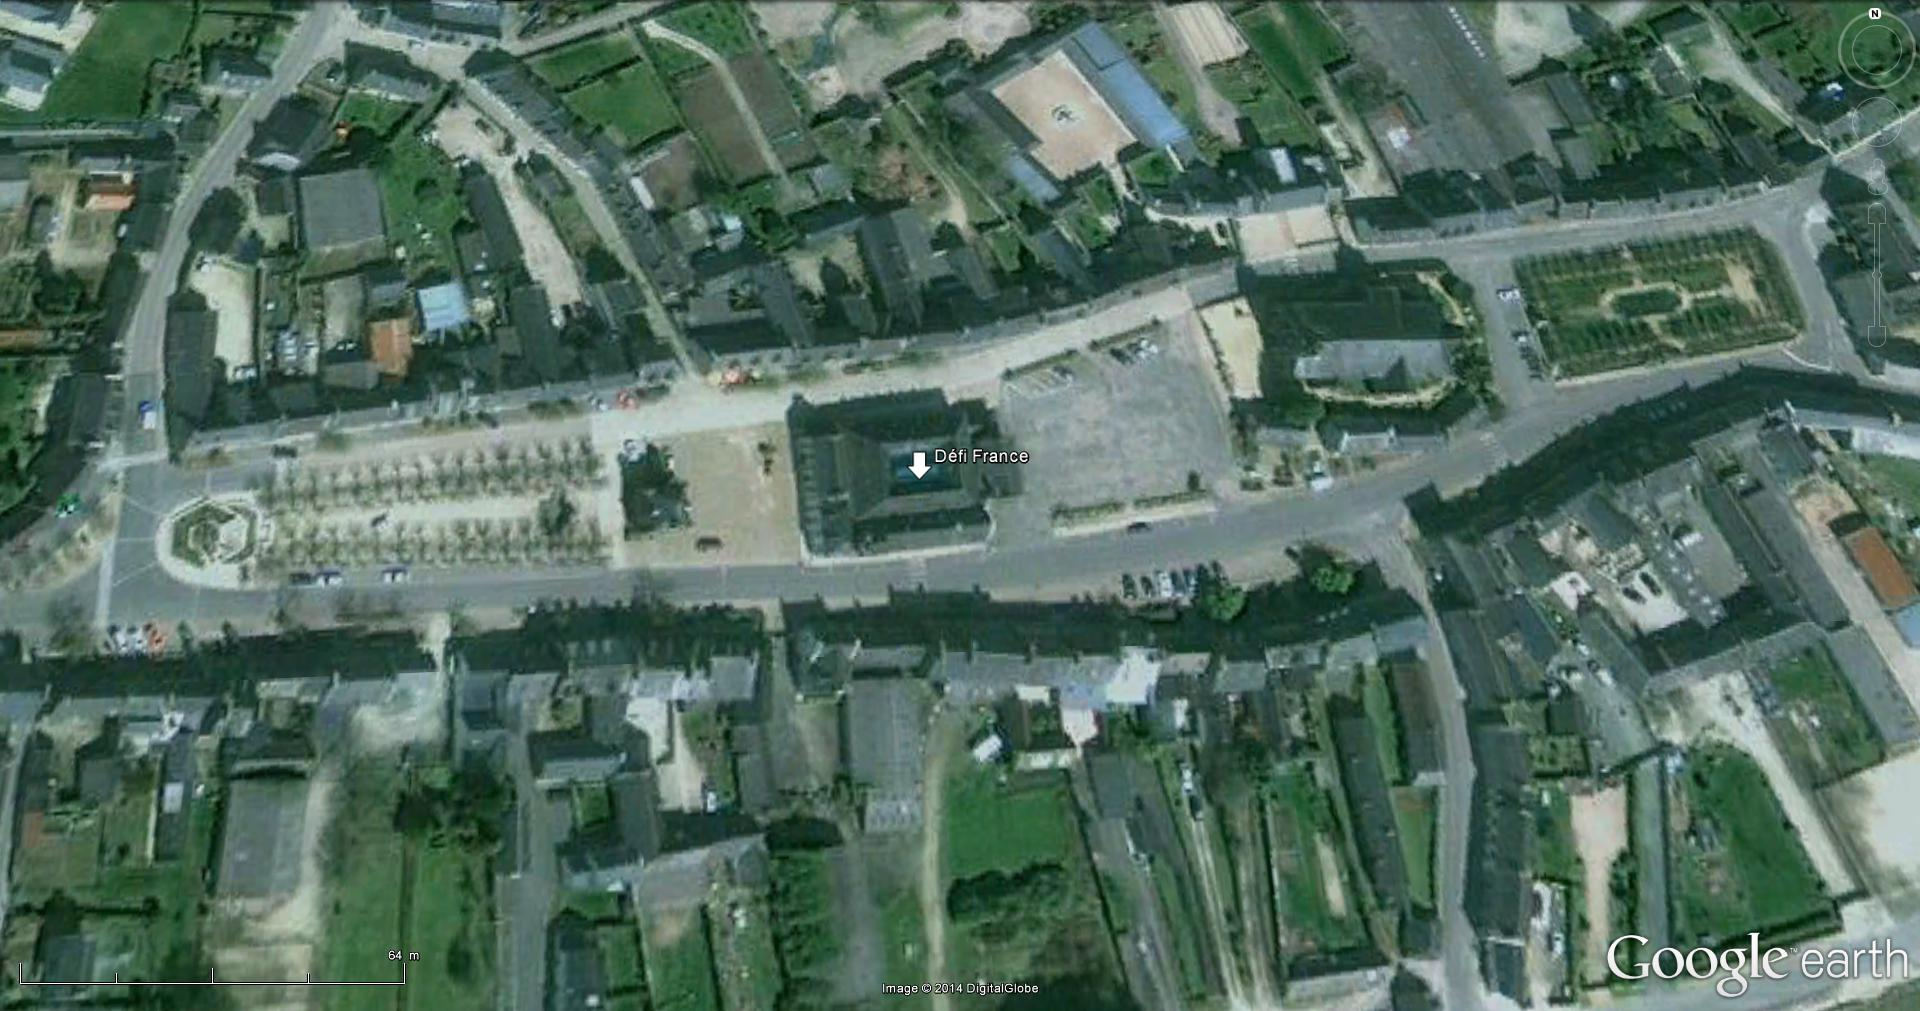 DEFIS ZOOM FRANCE 156 à 209 - (Novembre 2012/Juin 2014) - Page 64 Dafi_f12